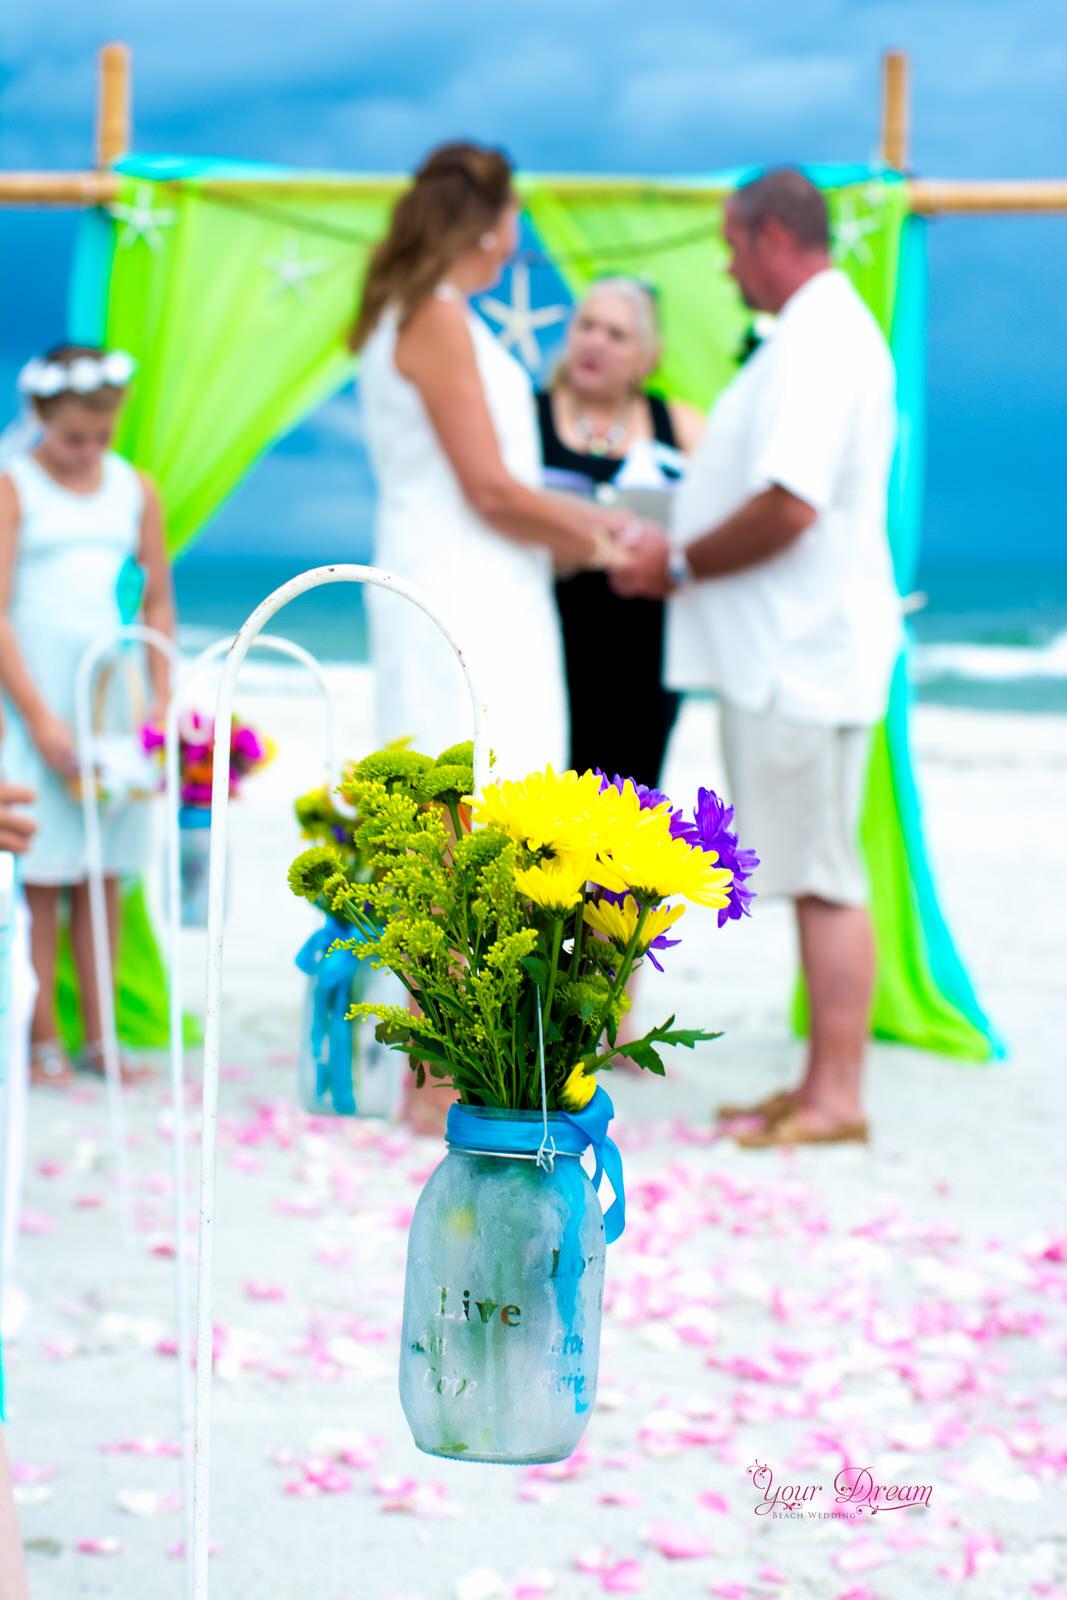 Perdidod Key wedding Photographer.jpg